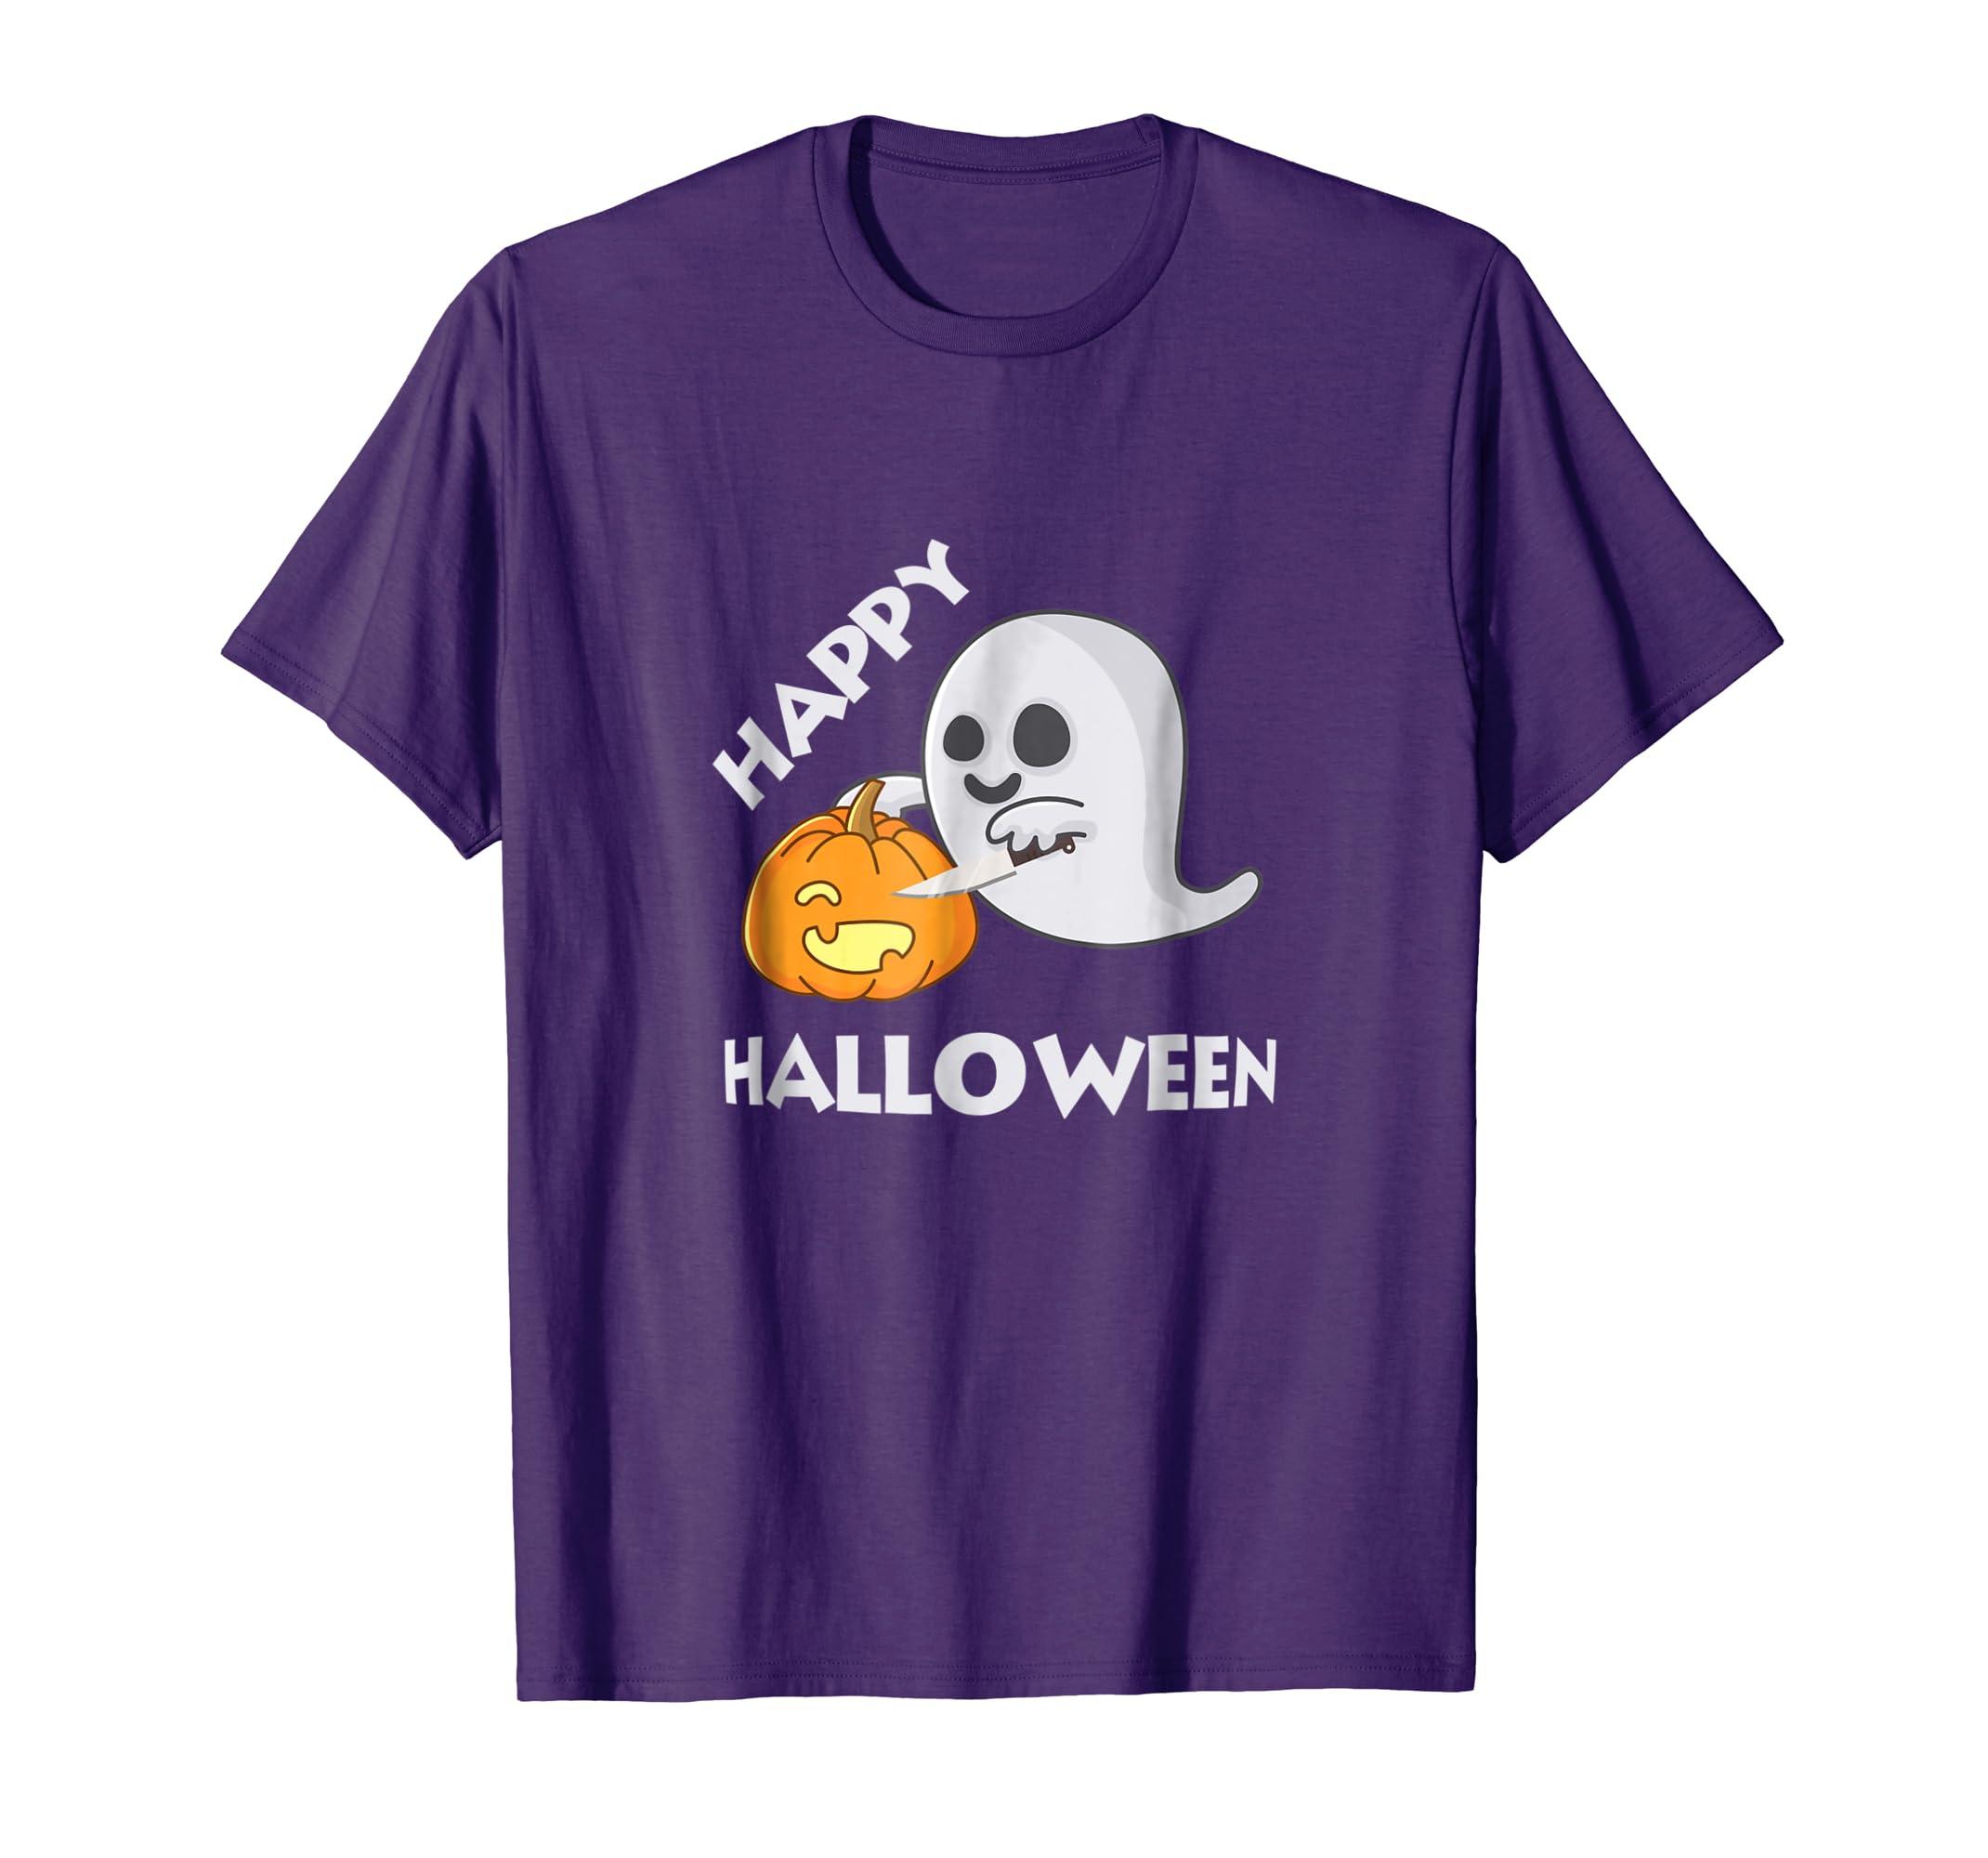 Spooky Halloween Ghost Carving Pumpkin T-Shirt for Girls-mt